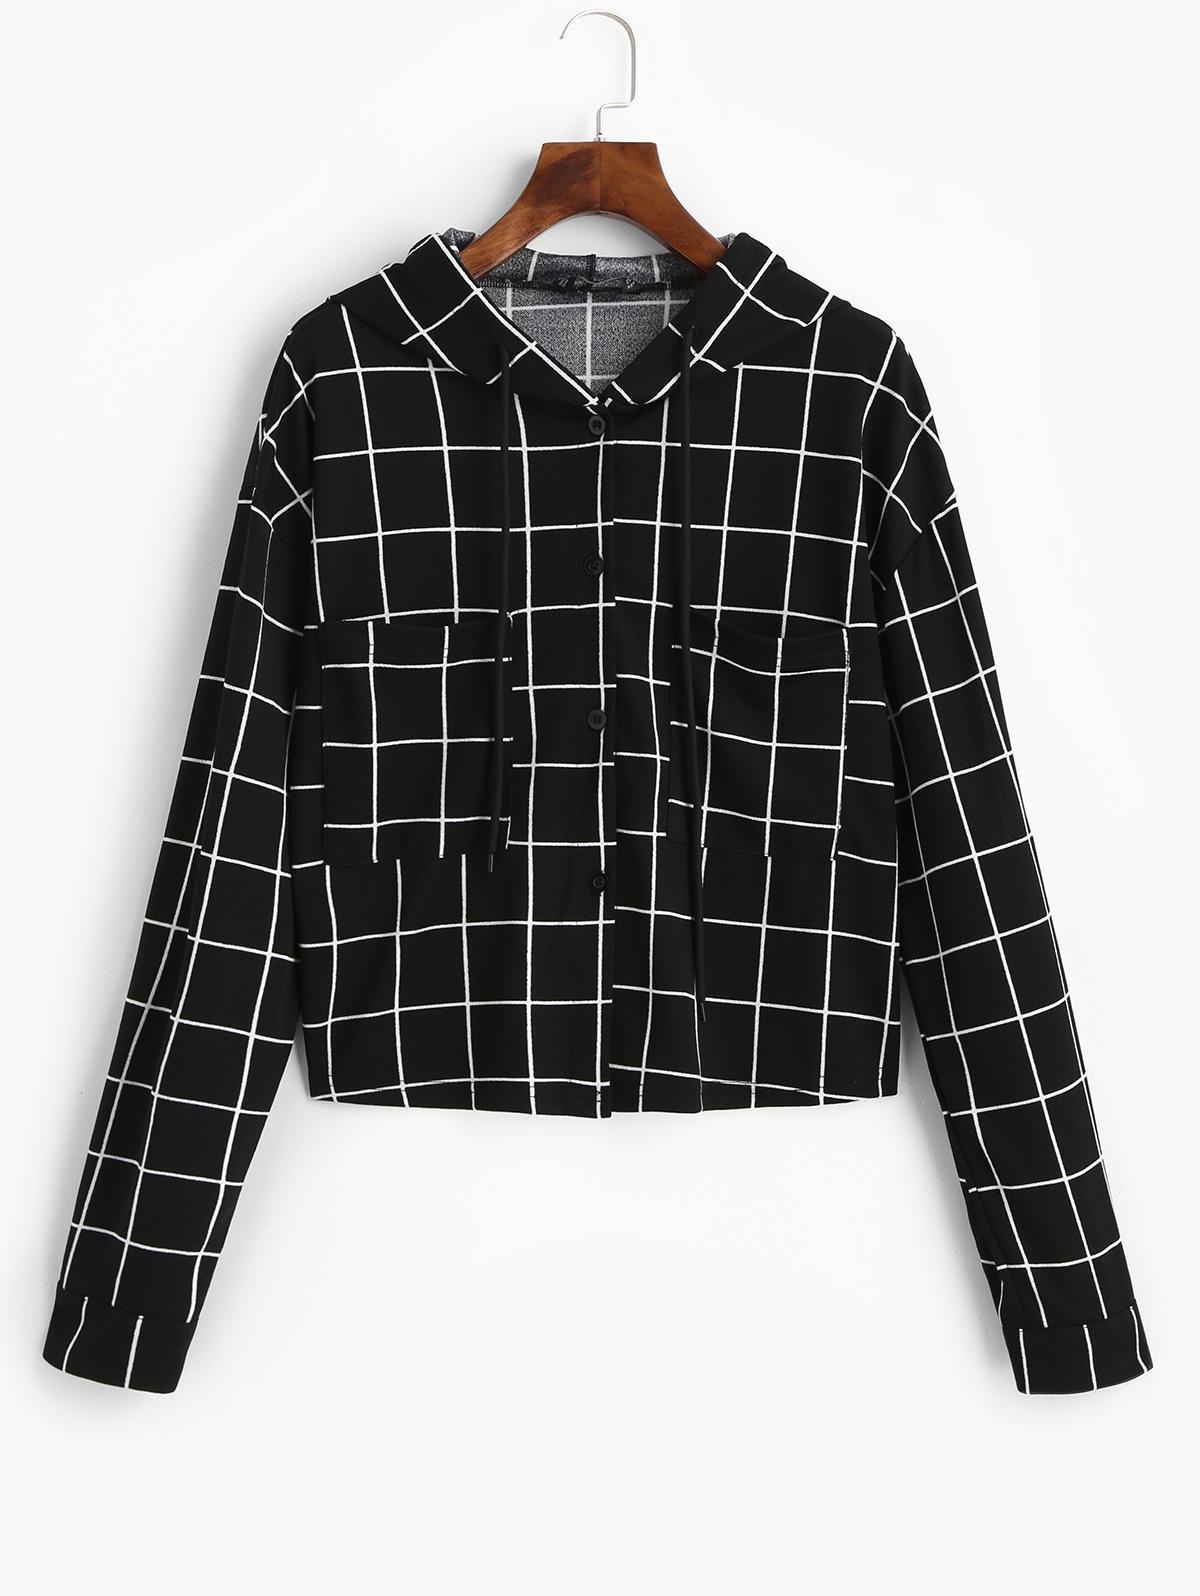 ZAFUL Button Up Drawstring Checked Pockets Jacket